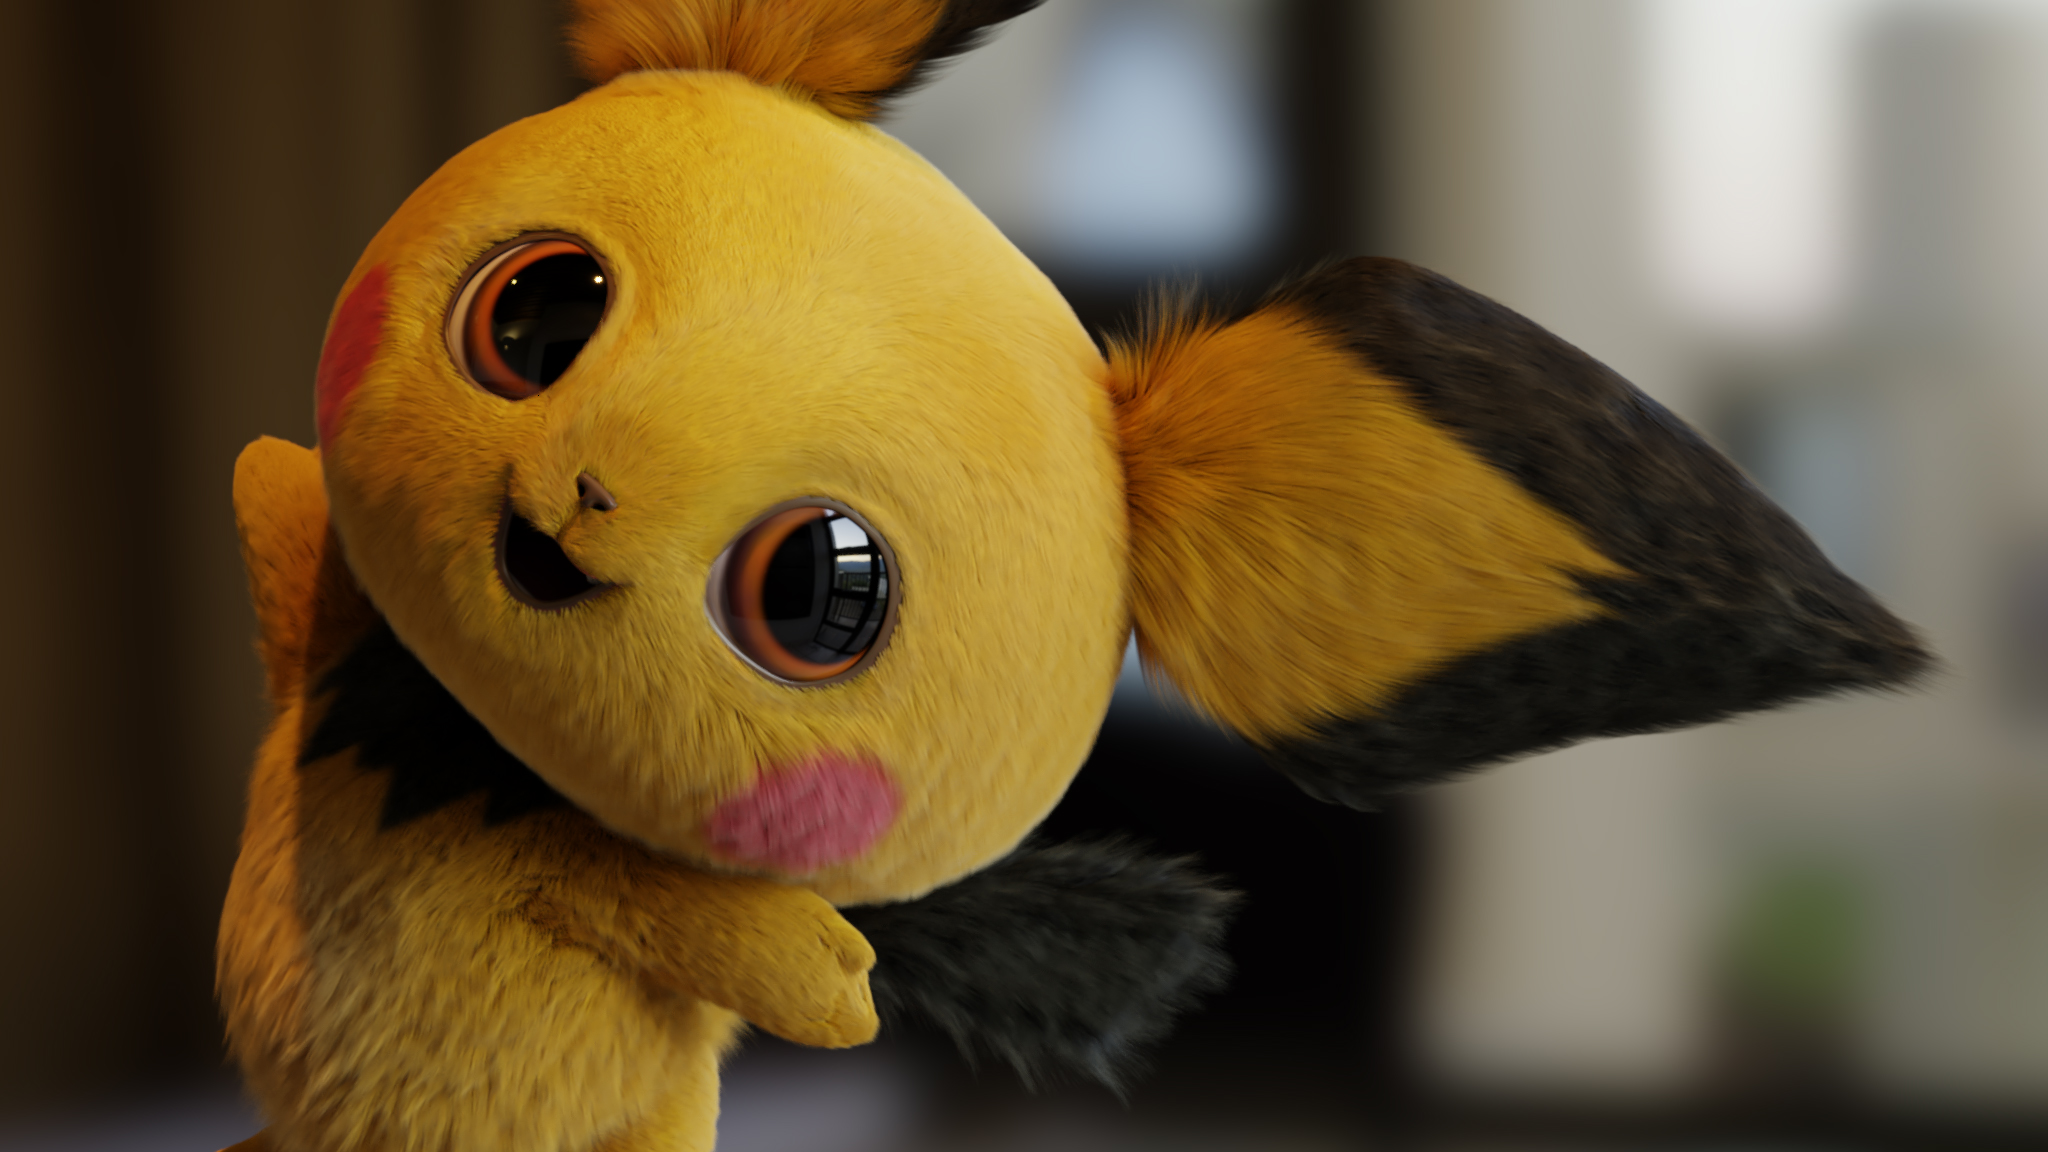 Pokémon Detective Pikachu HD Wallpaper | Background Image | 2048x1152 | ID:970342 - Wallpaper Abyss